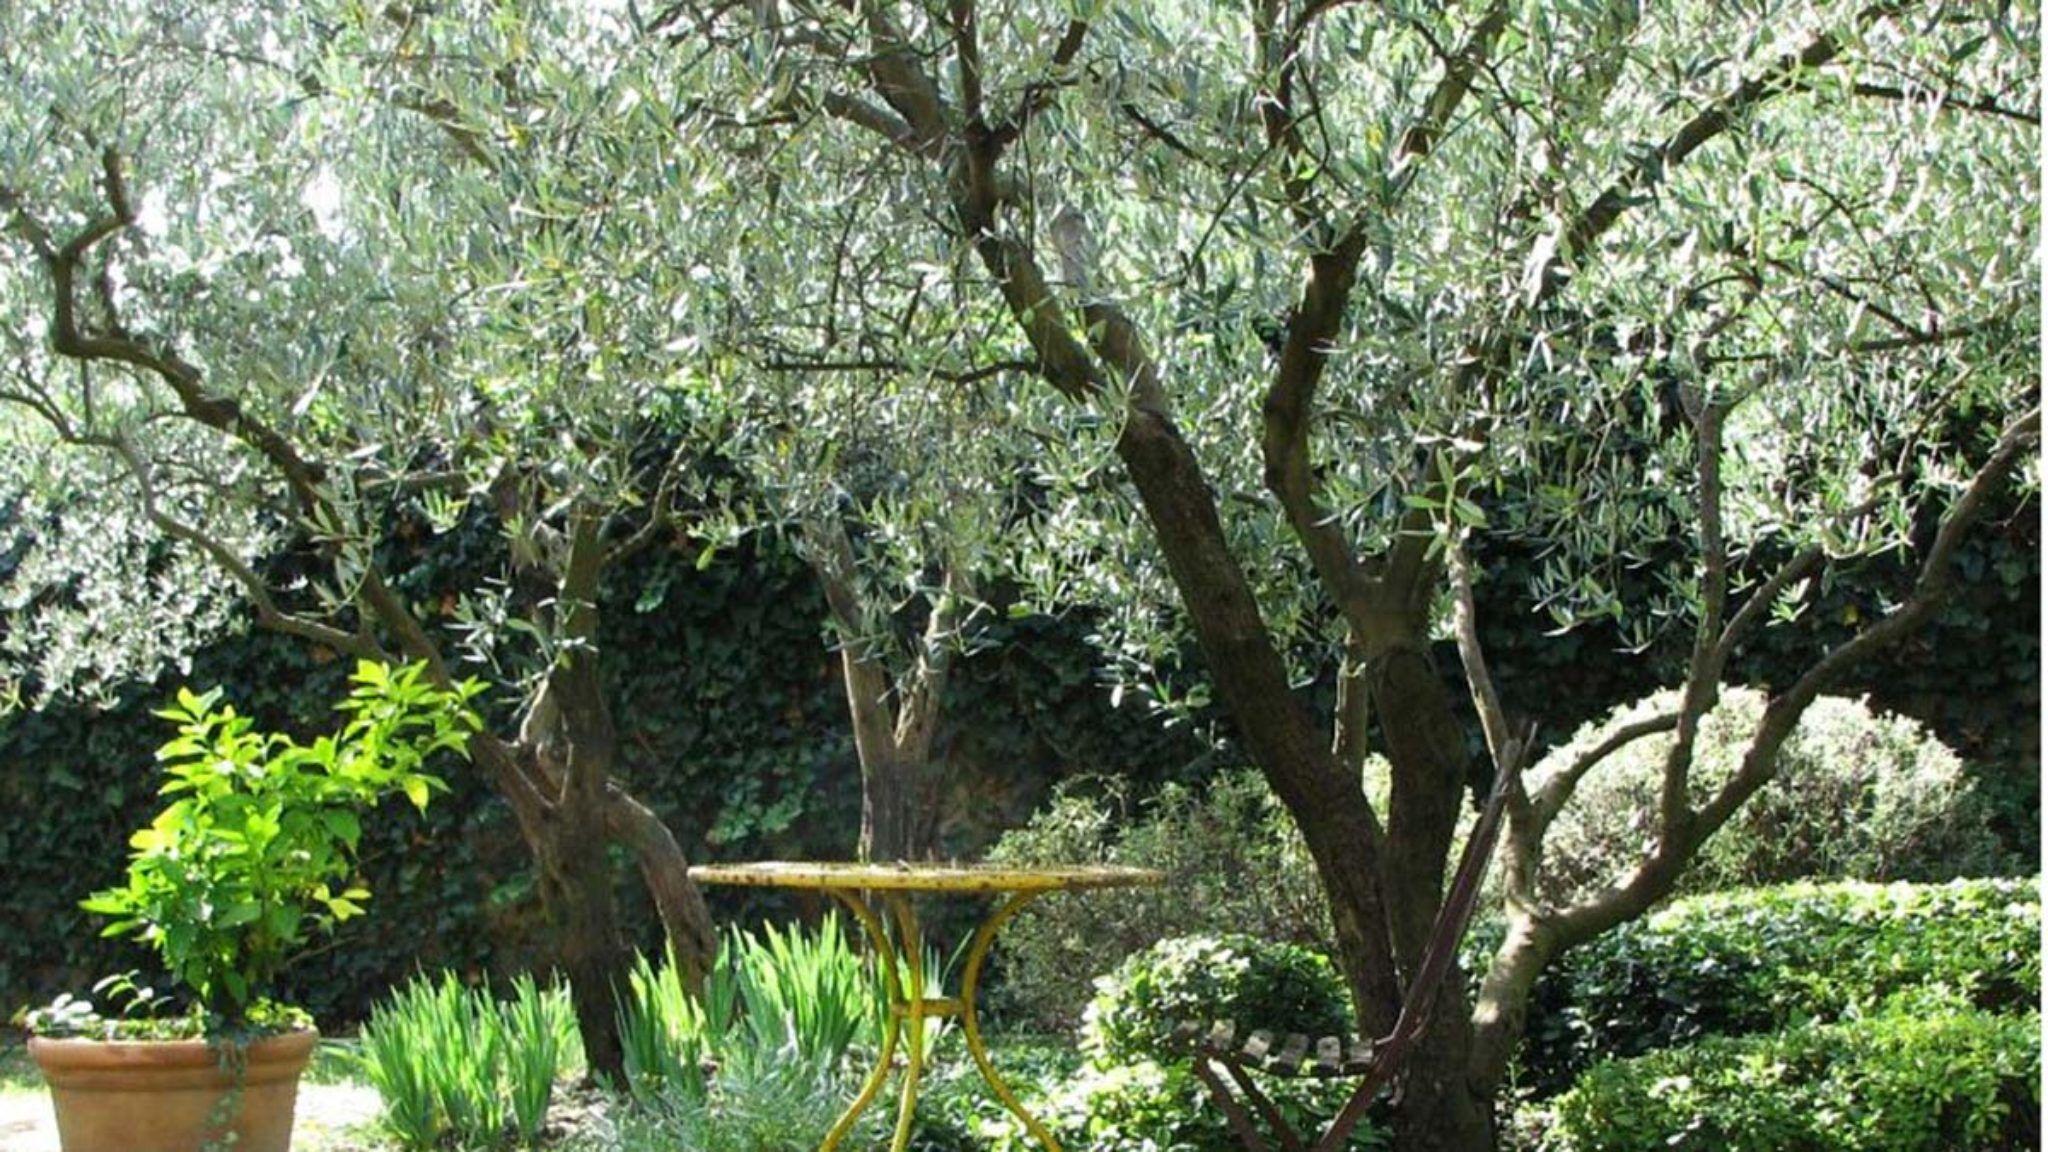 Garden Housecalls - Gun-Shy About Trees?